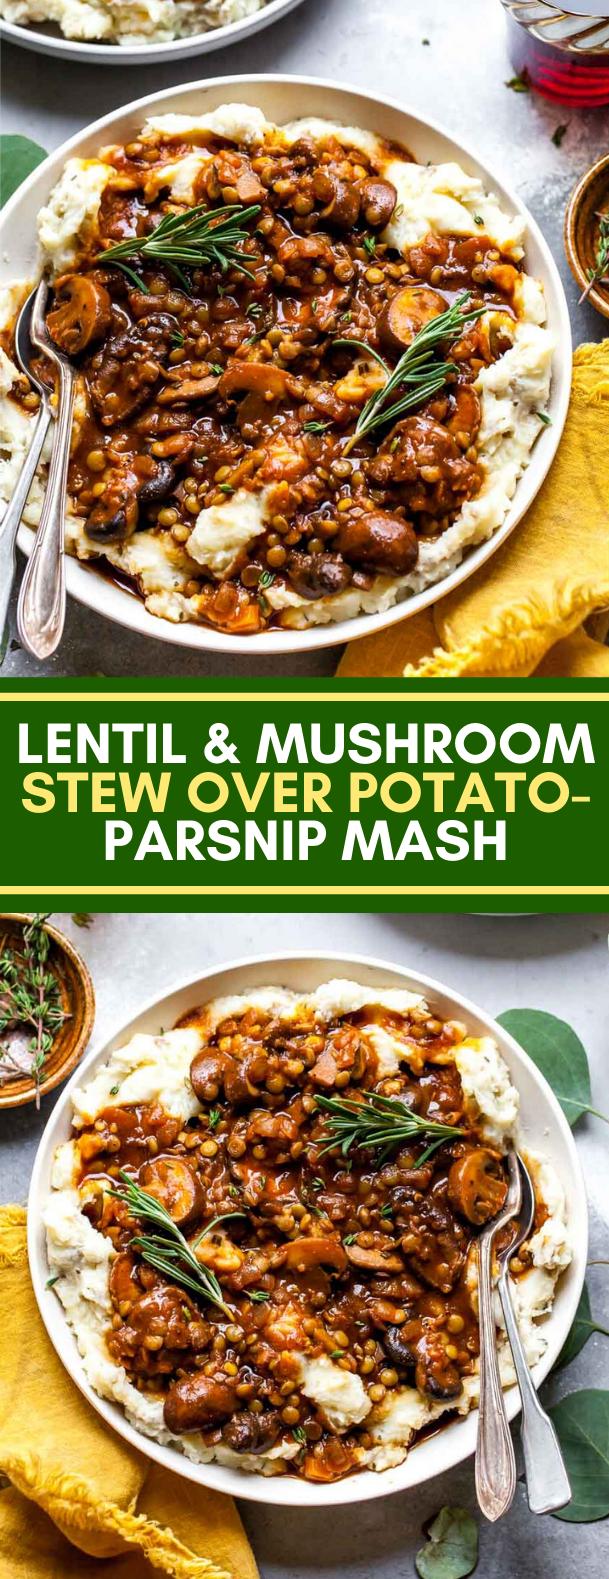 LENTIL AND MUSHROOM STEW OVER POTATO-PARSNIP MASH #vegetarian #dinner